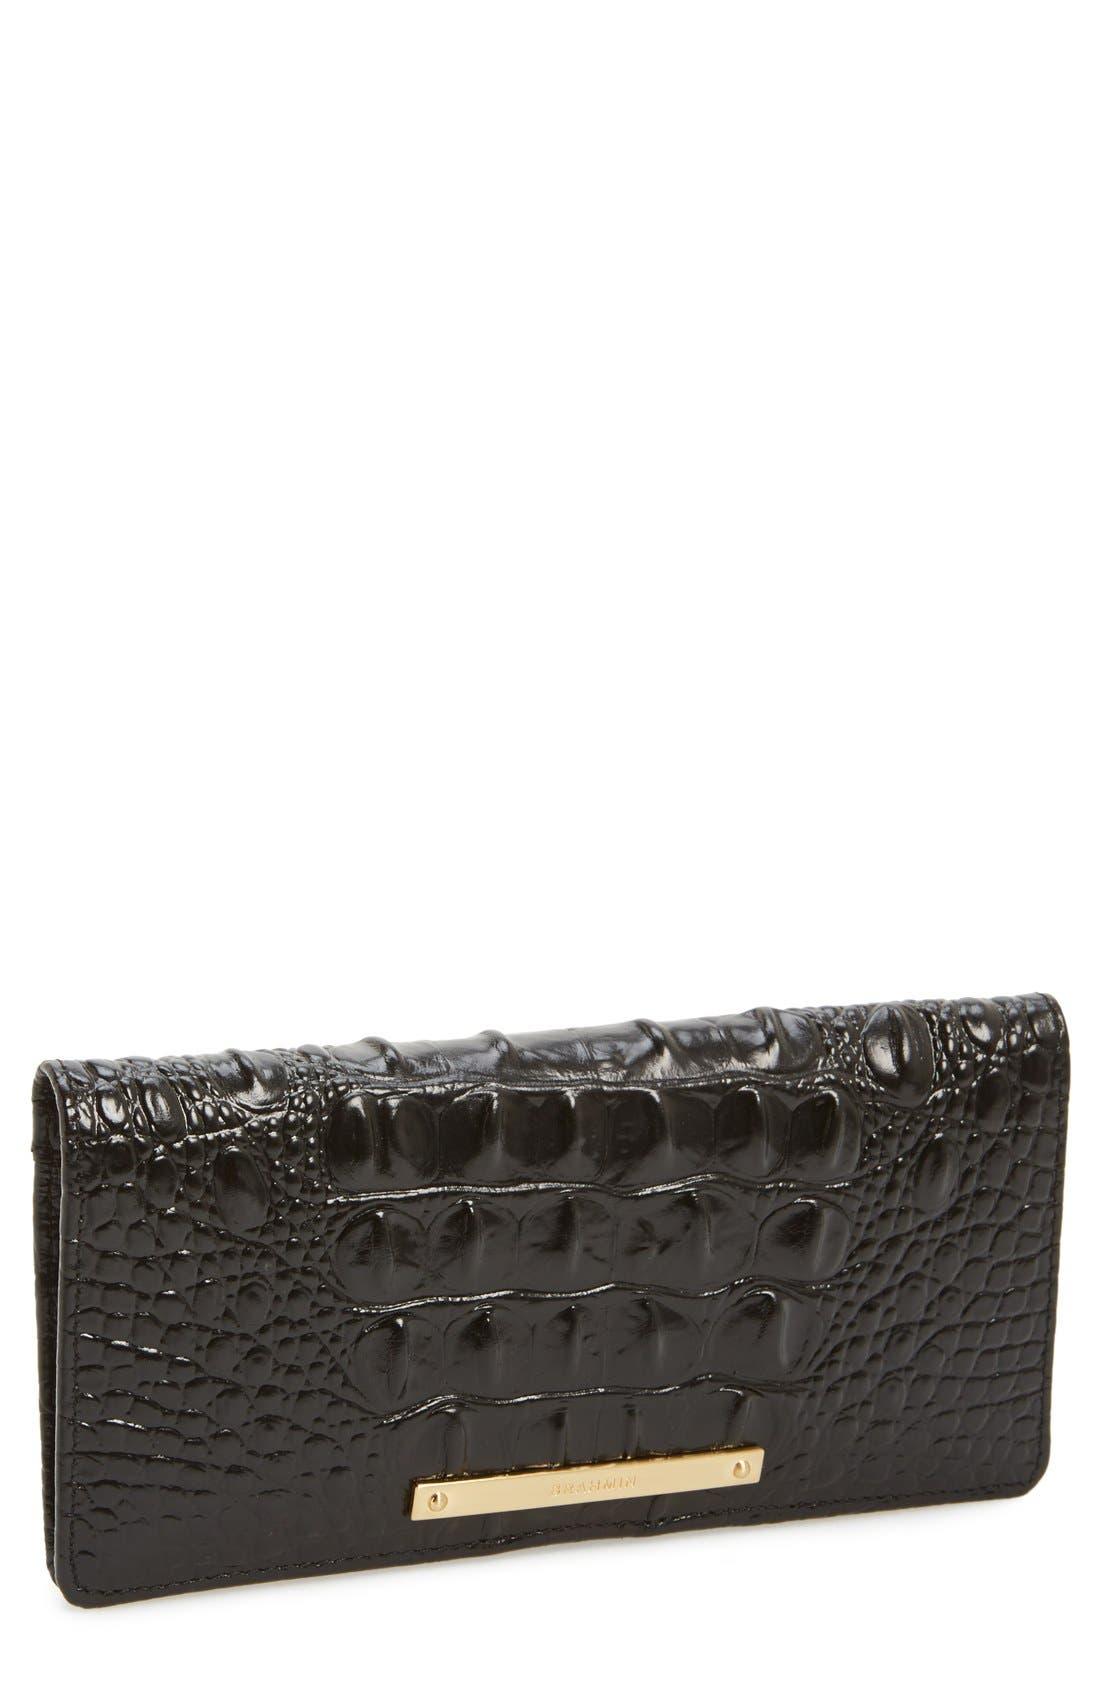 BRAHMIN Ady Croc Embossed Continental Wallet